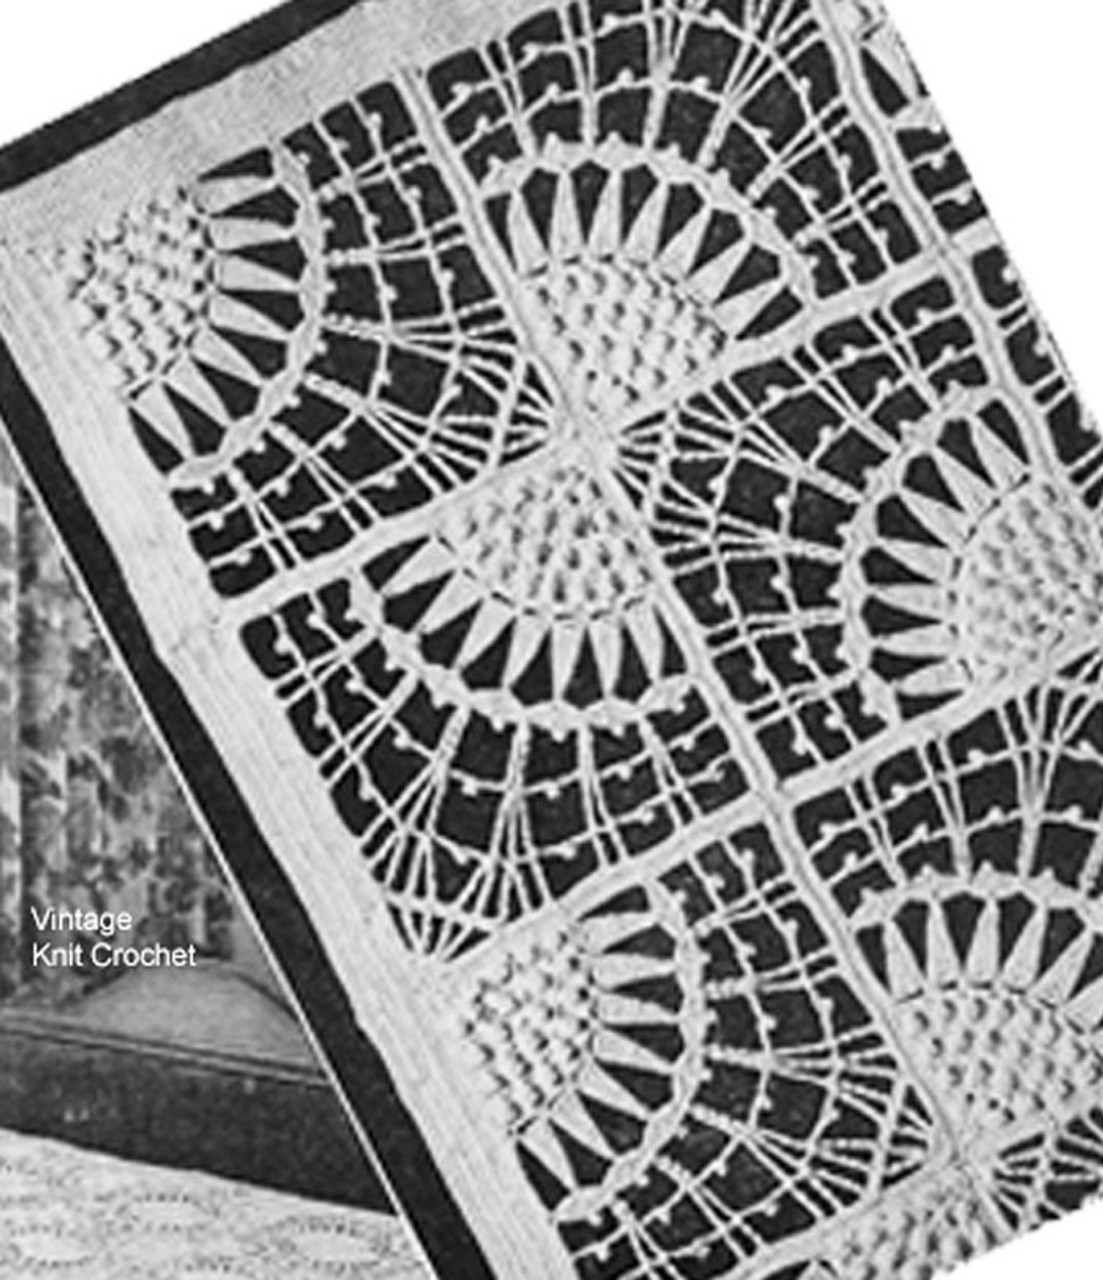 Butterfly Bows Crochet Block Illustration